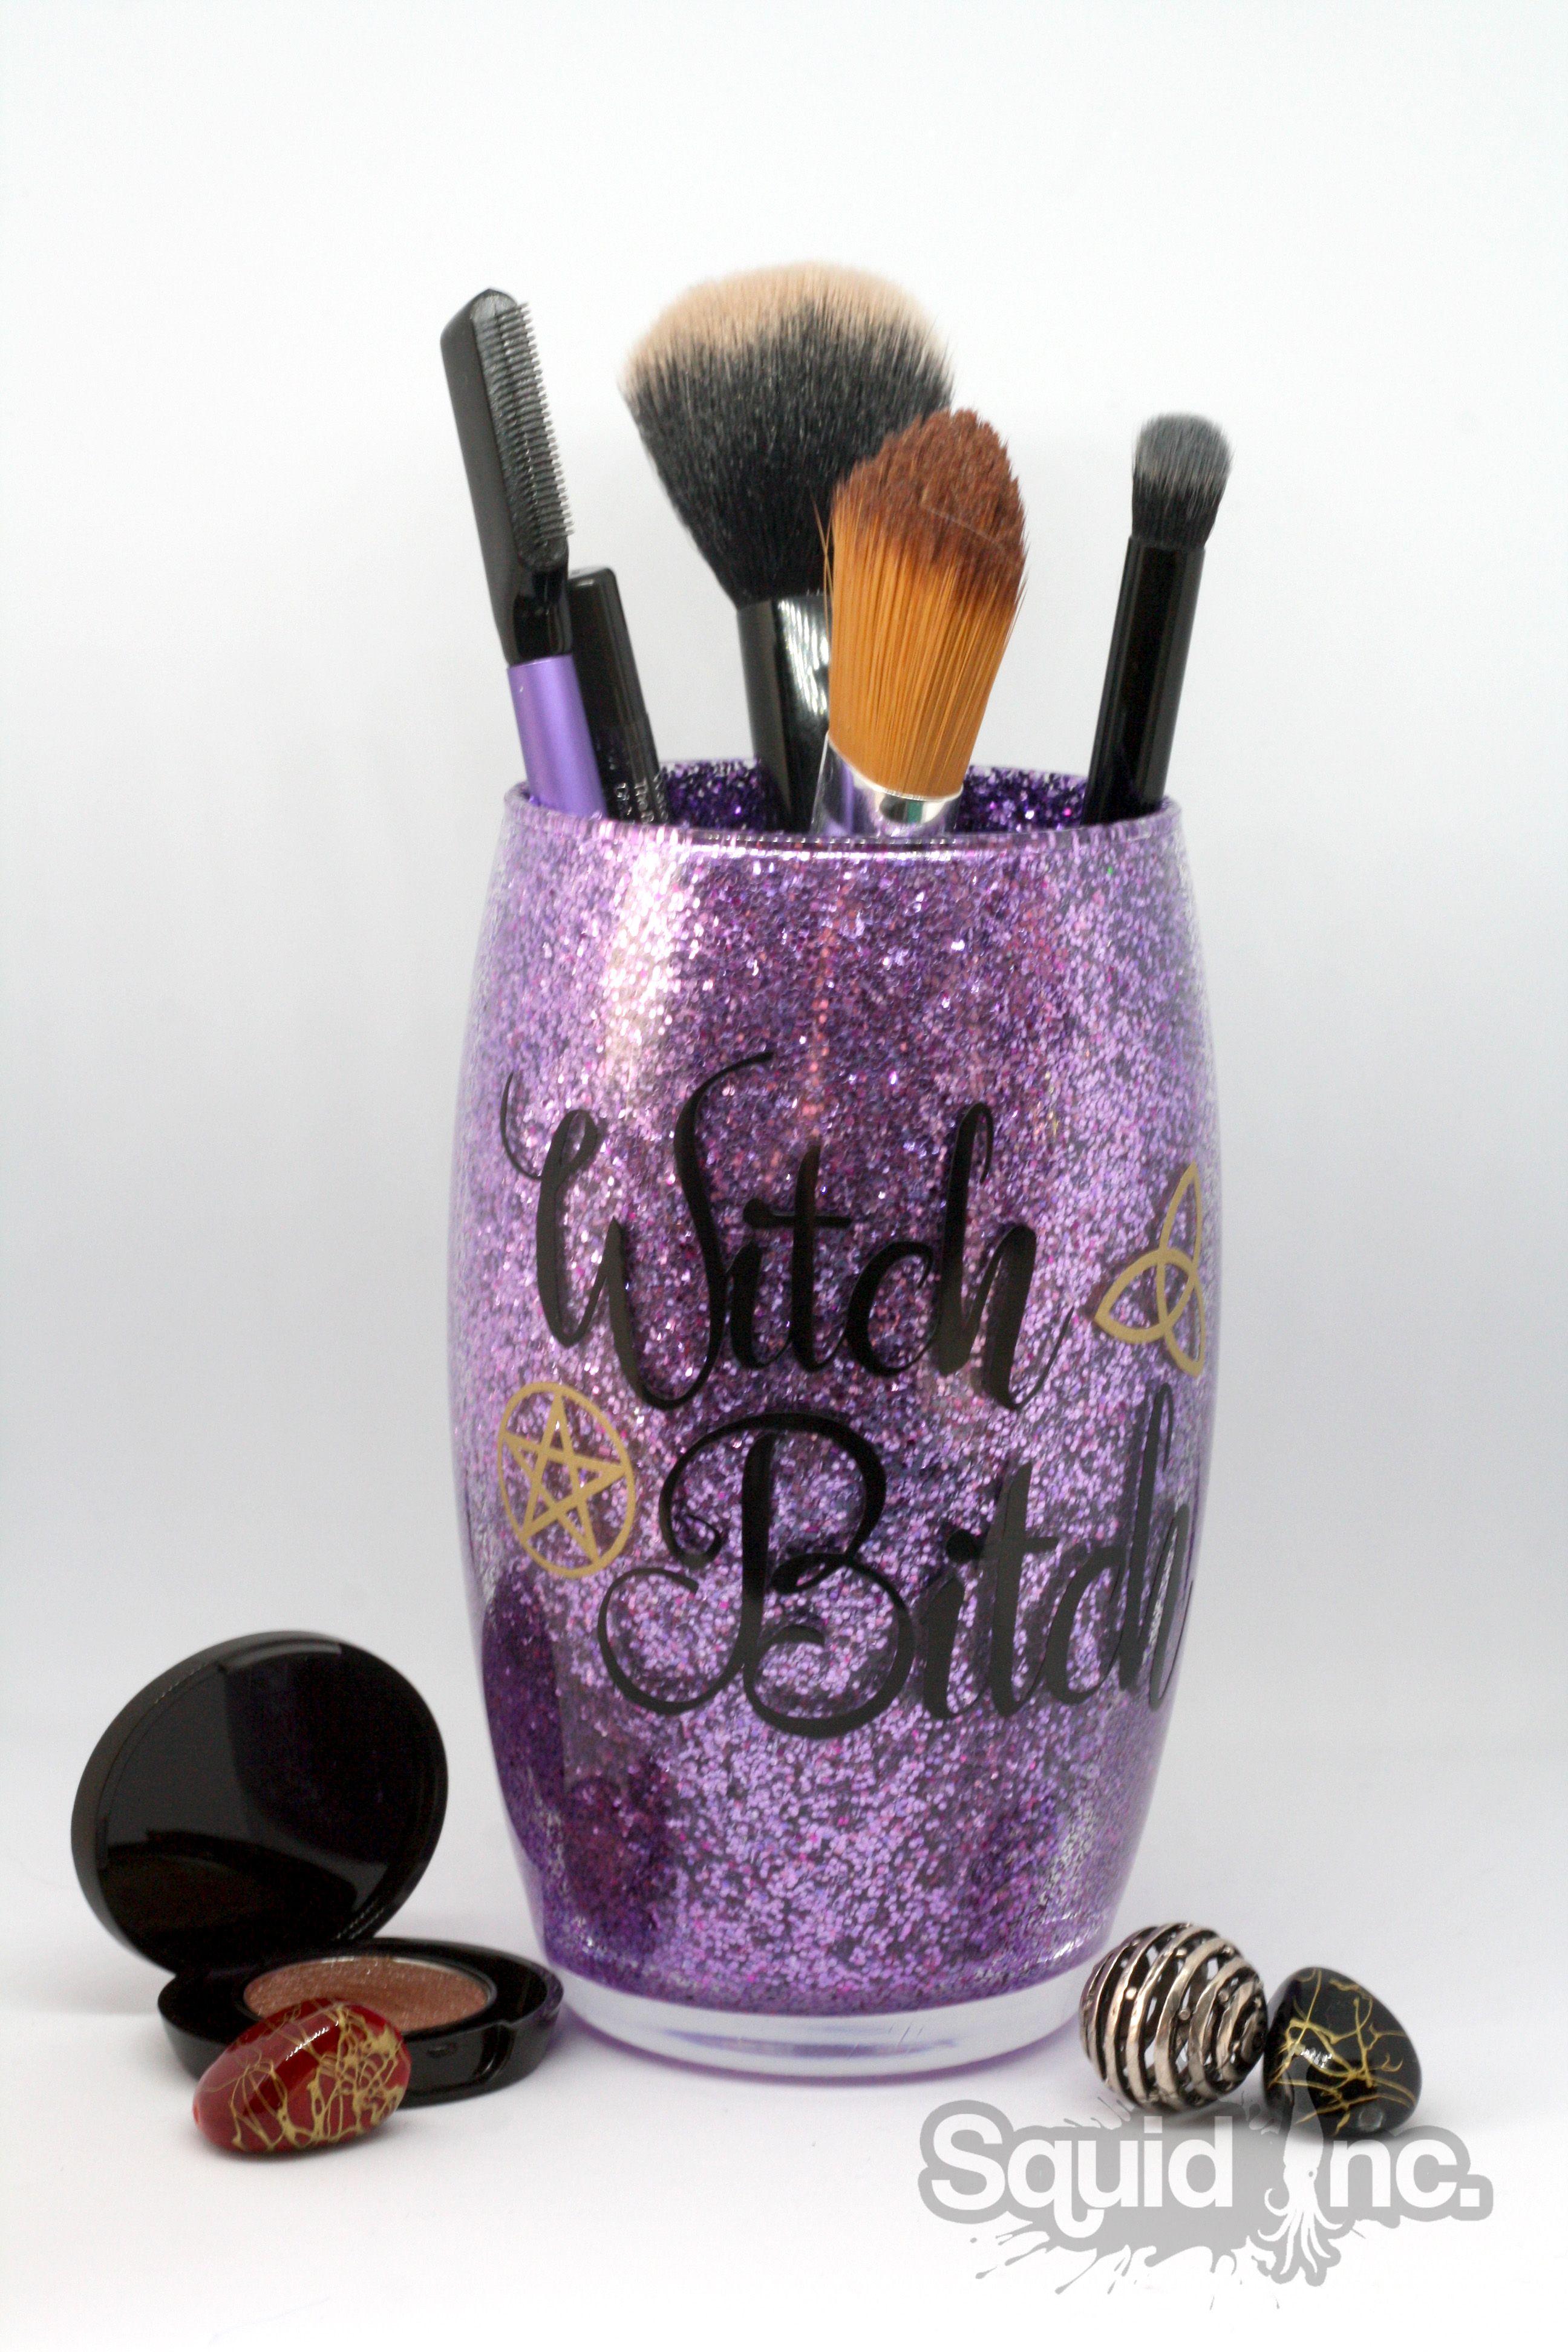 Glitter makeup brush/paint brush/pens/pencil holders funny